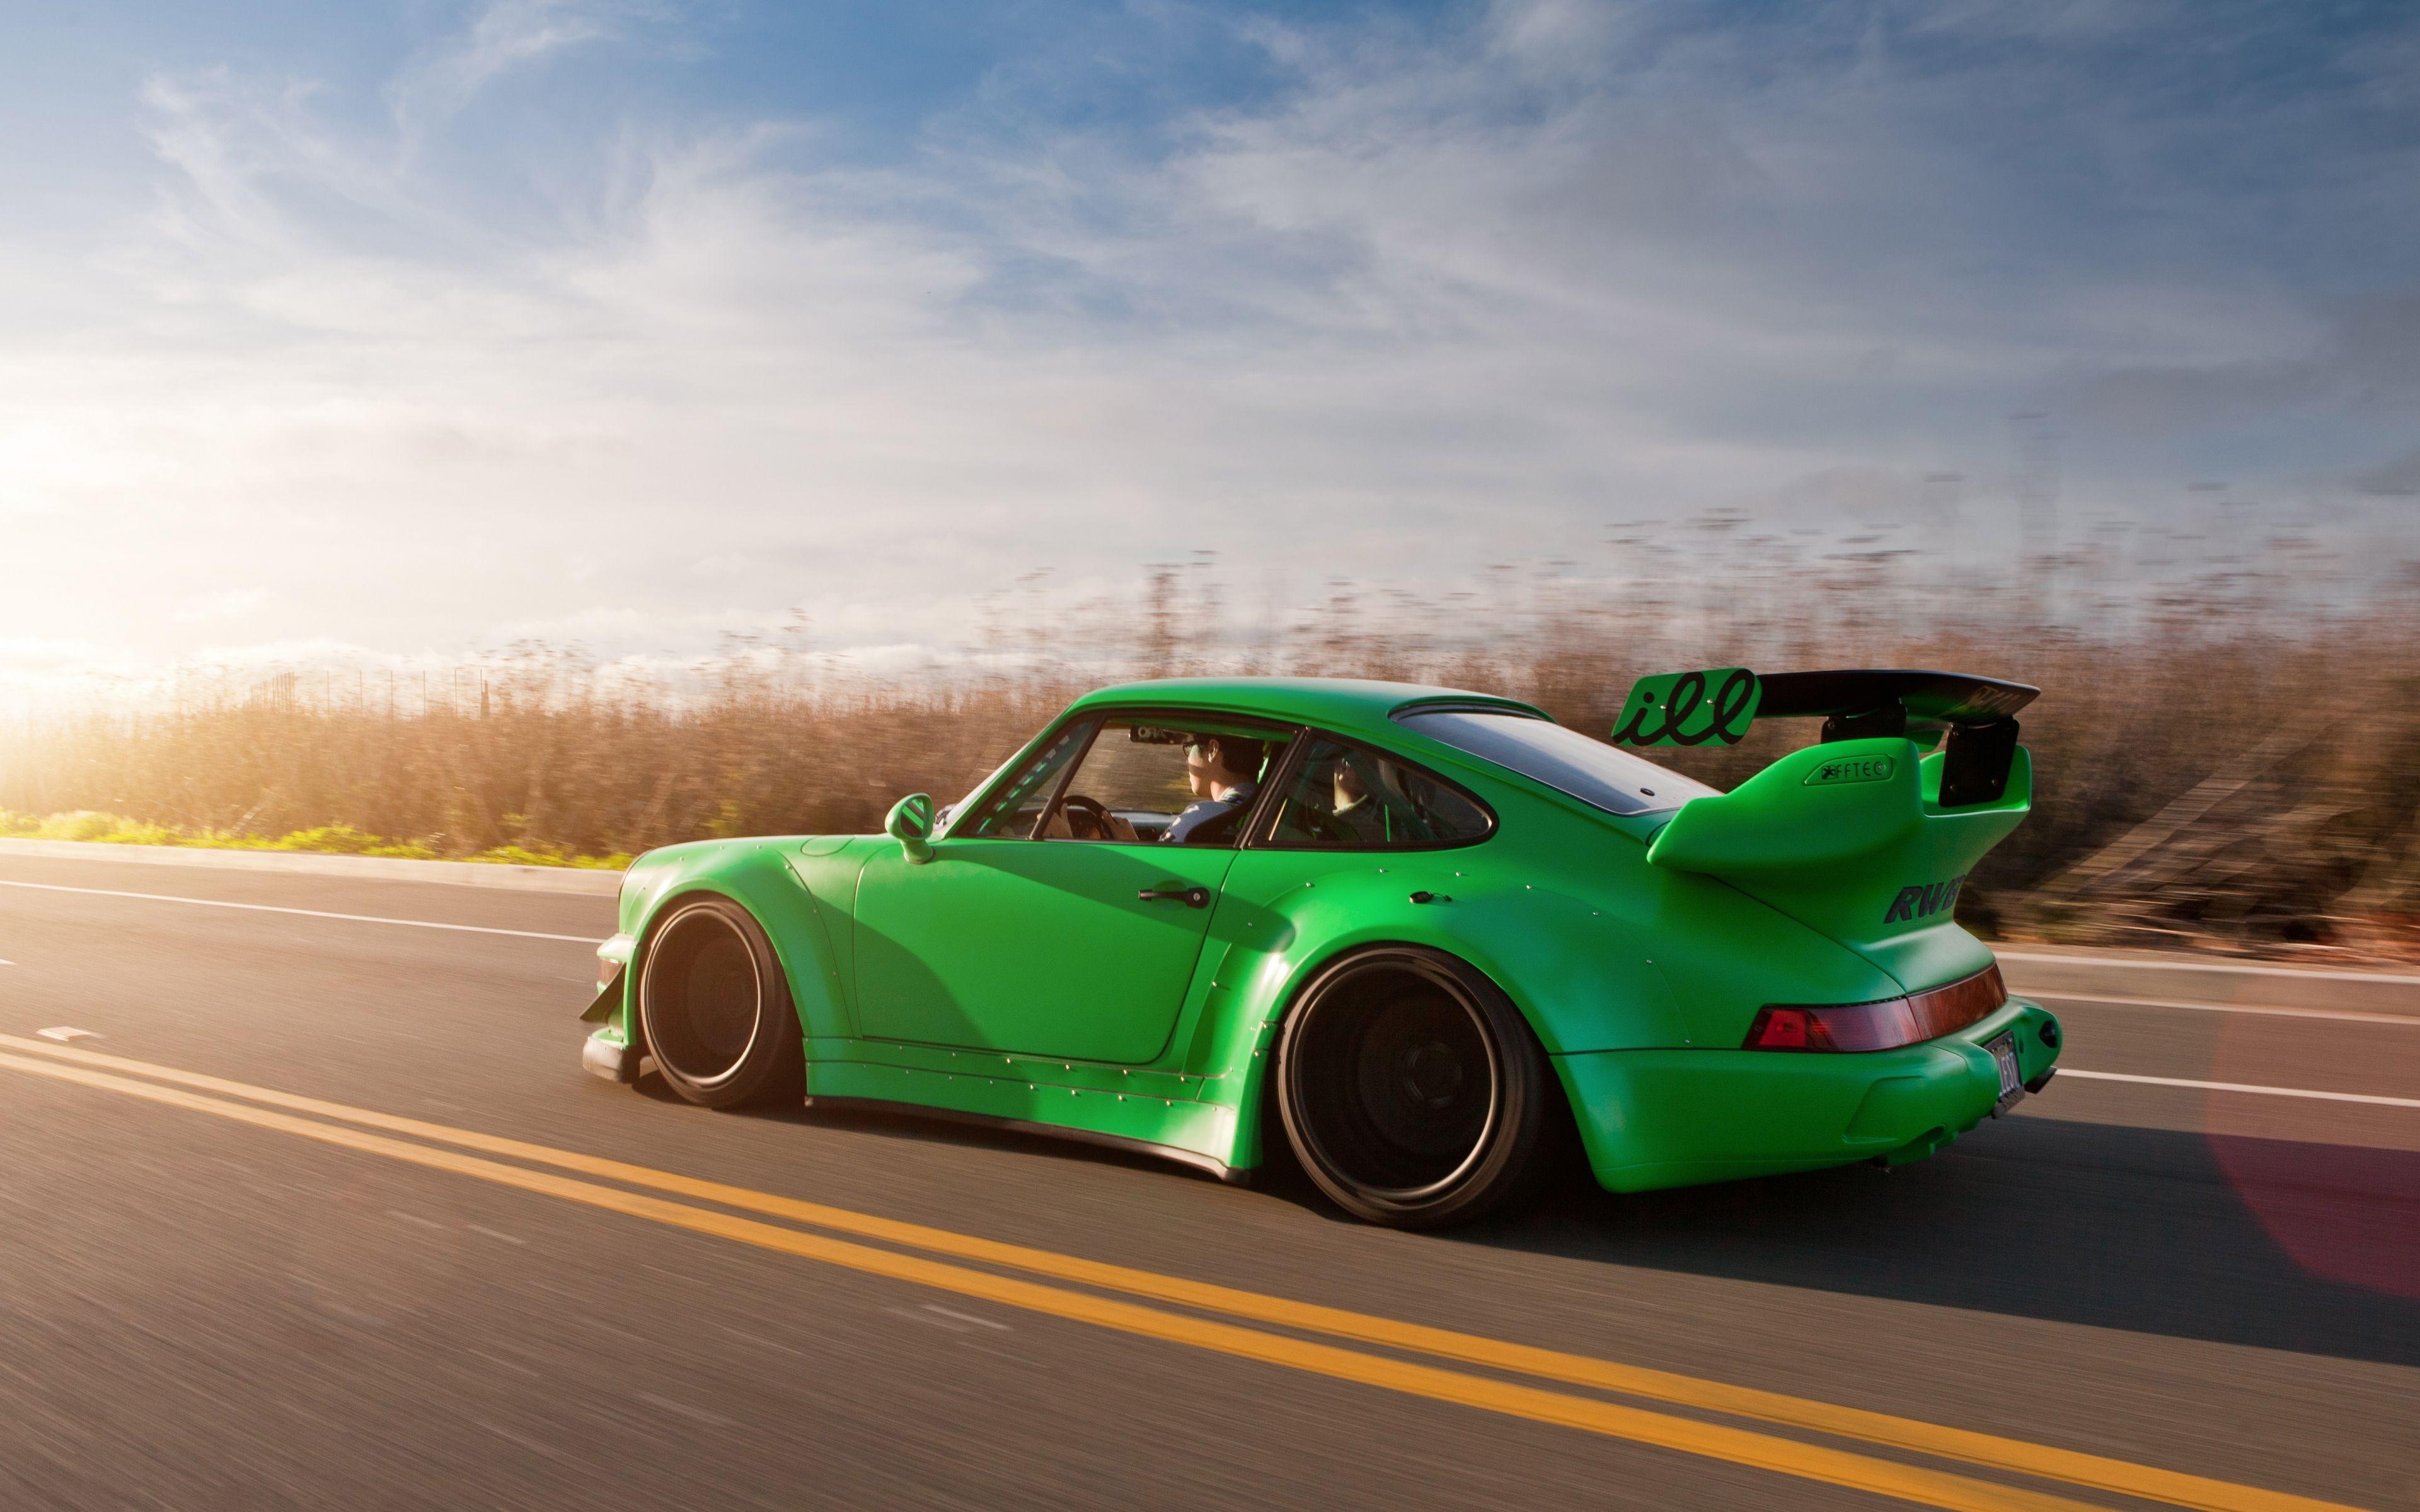 4k Car Wallpapers Top Free 4k Car Backgrounds Wallpaperaccess